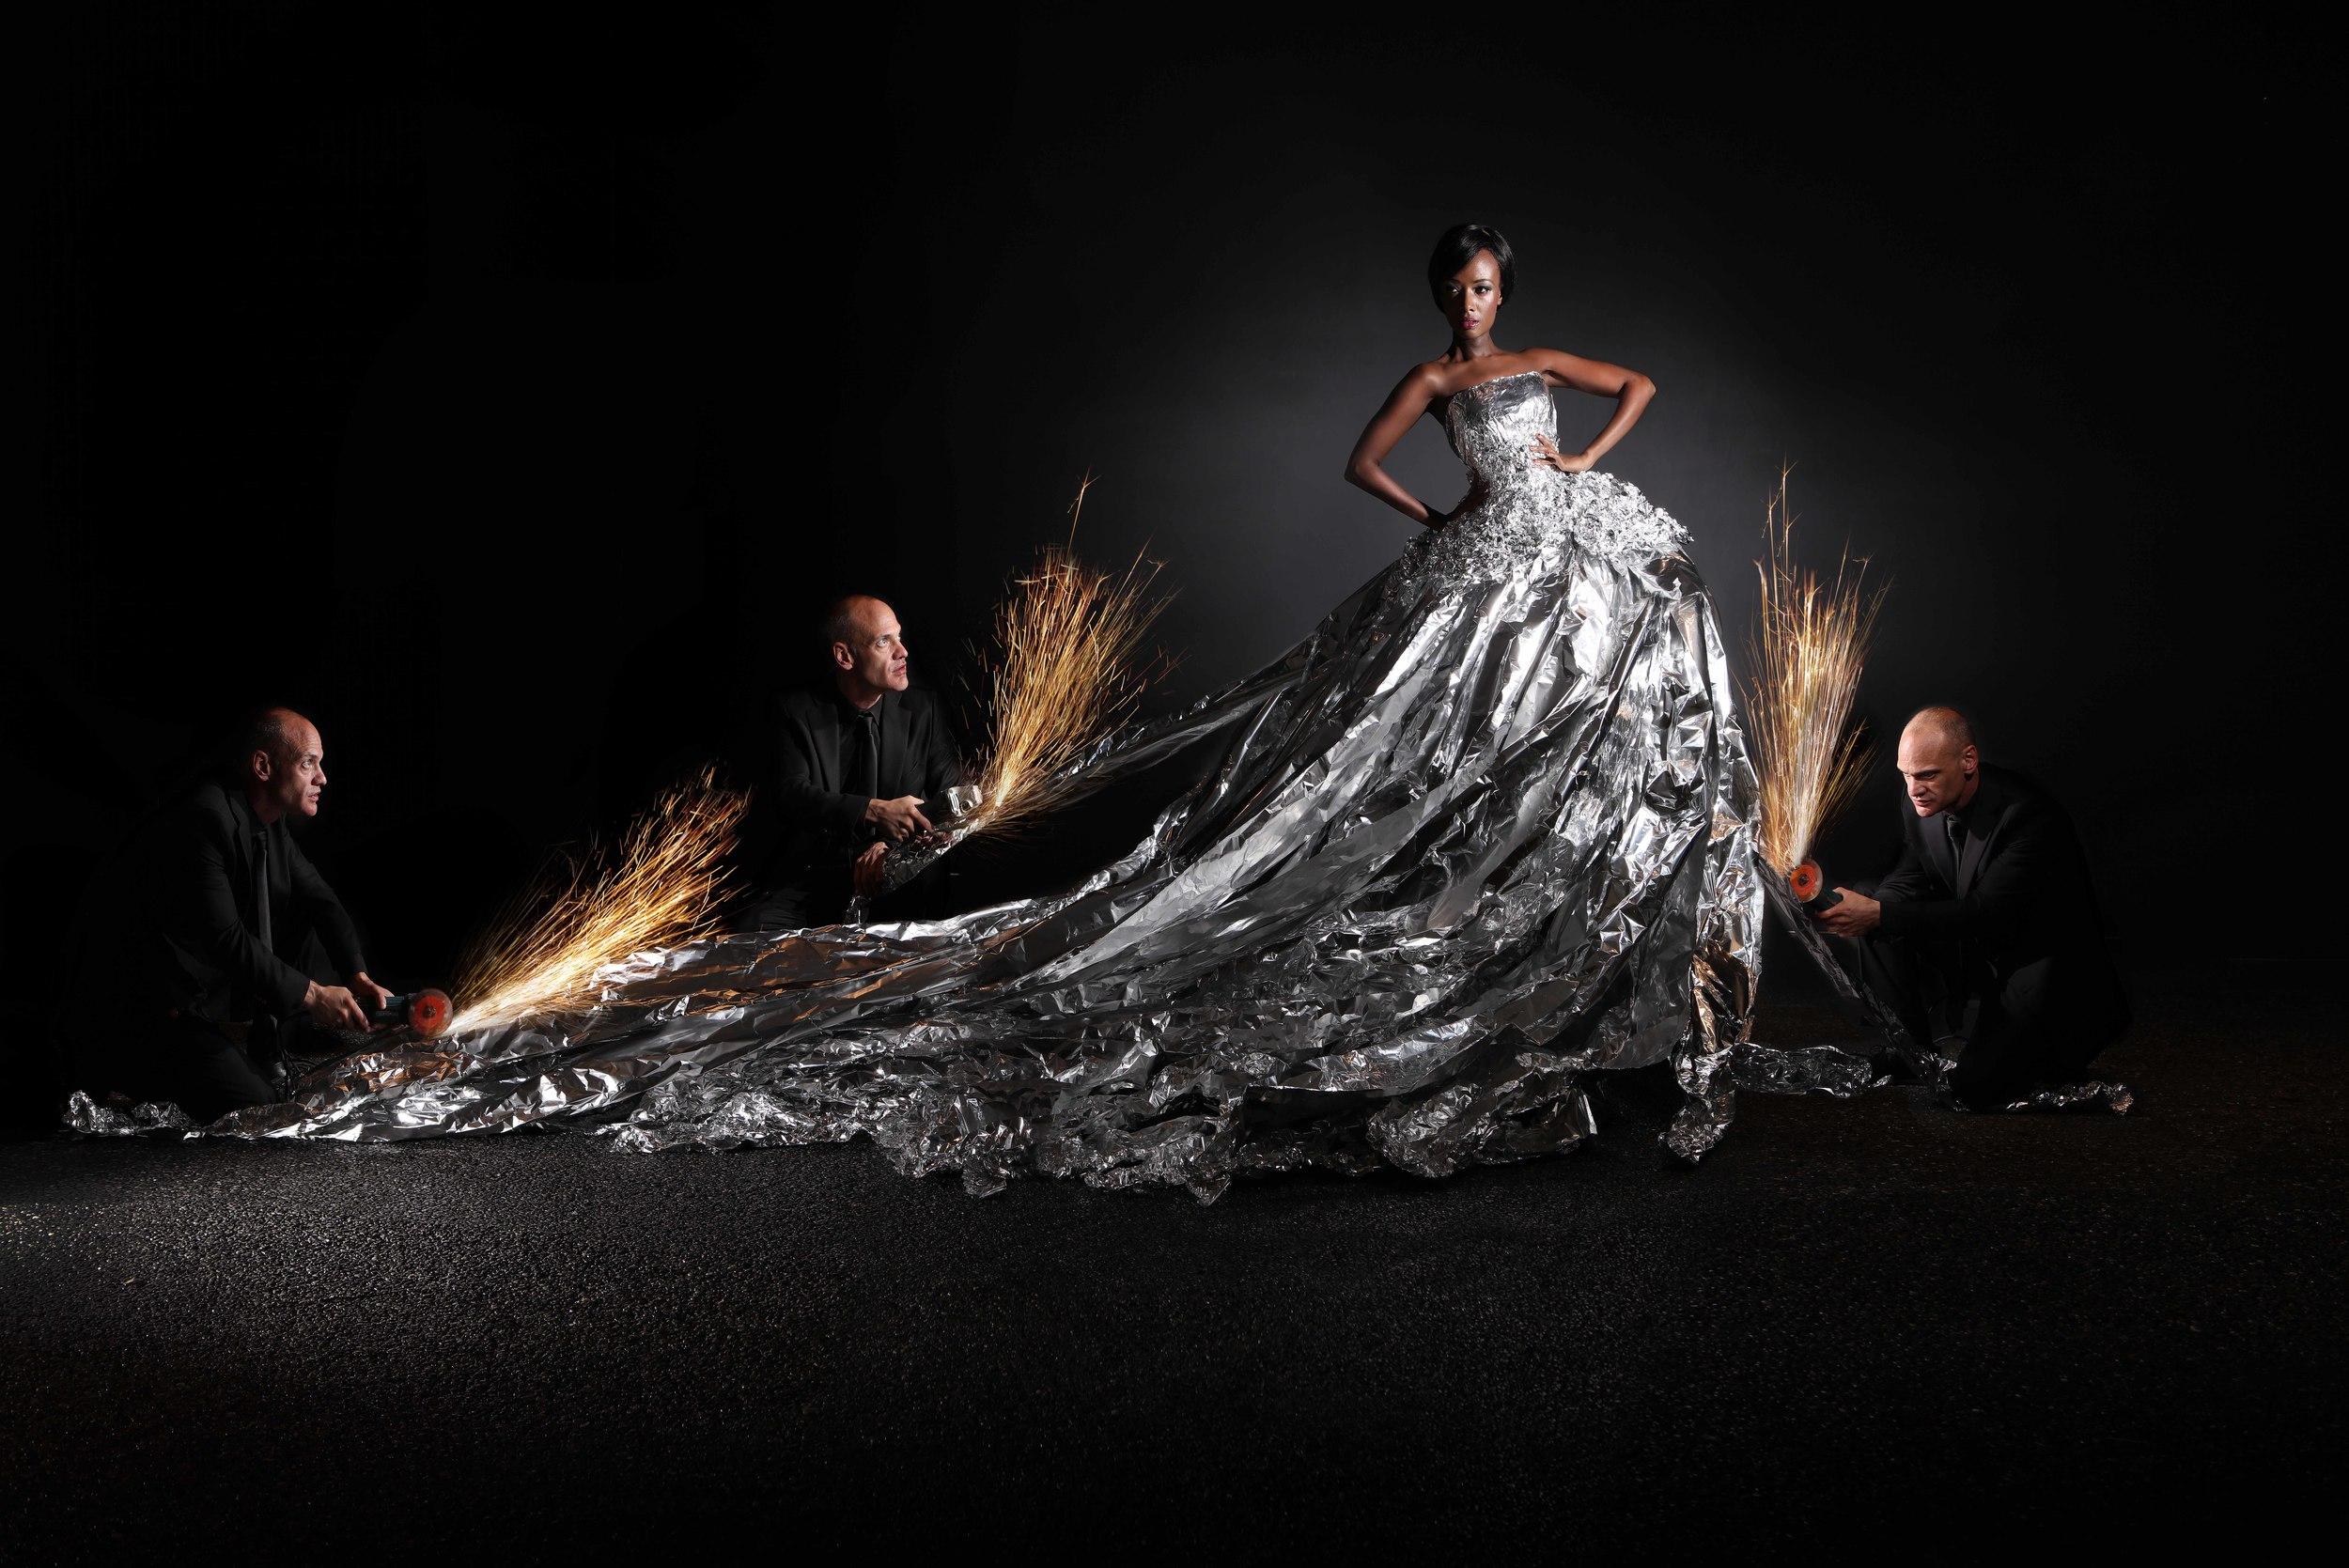 tin+foil+wedding+dress+lrg_web.jpg